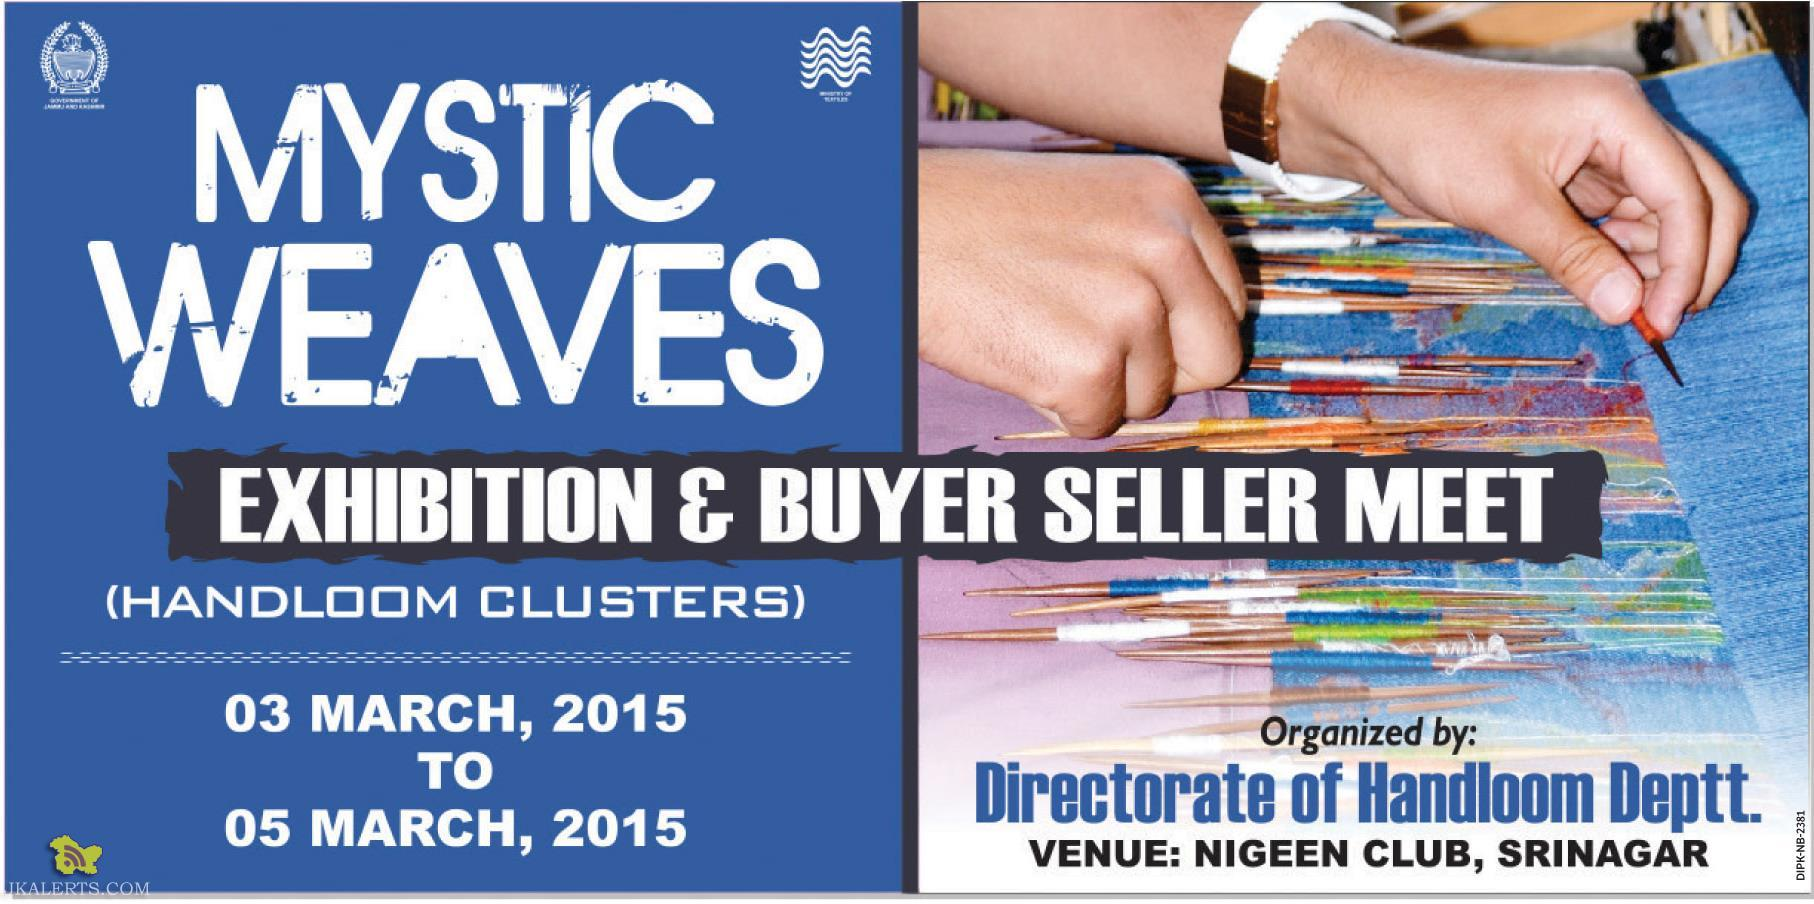 Mystic Weaves Exhibition & Buyer Seller Meet Srinagar